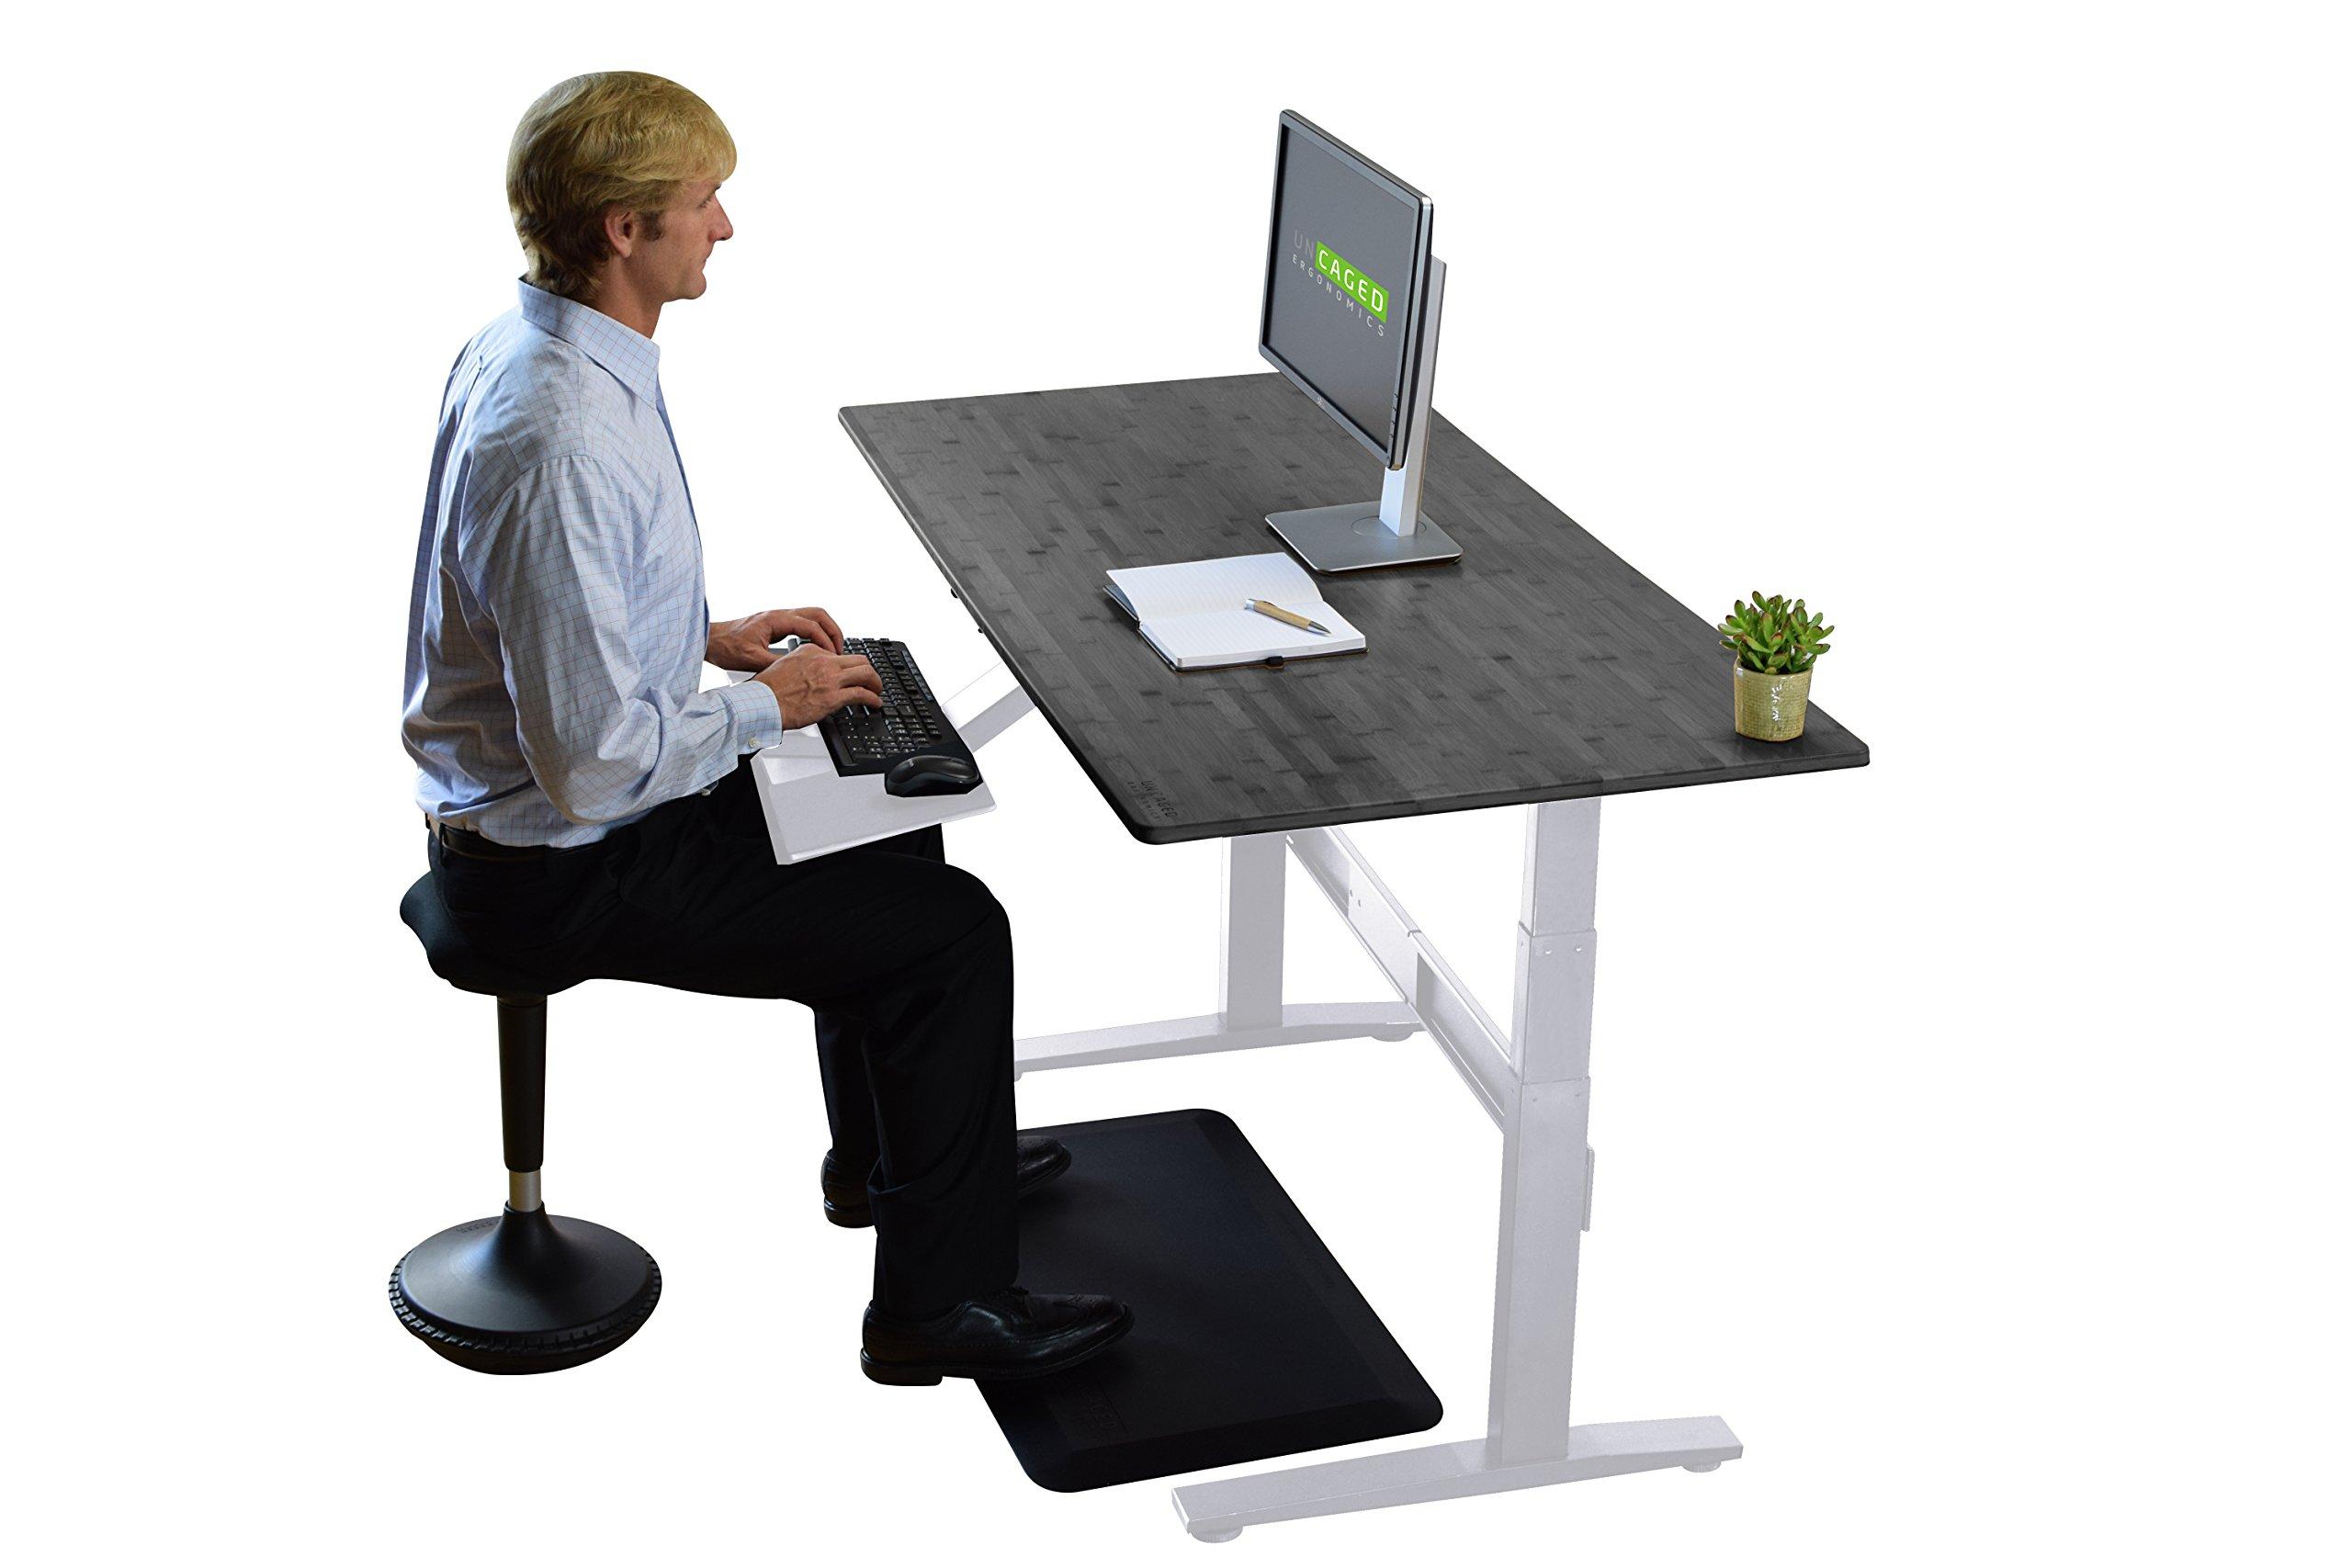 RISE UP Electric Adjustable Height Standing Desk + Beautiful Black Bamboo Desktop| Memory Keypad| 2 Motors| Affordable Ergonomic Sit Stand Office Desk by Uncaged Ergonomics (Image #6)